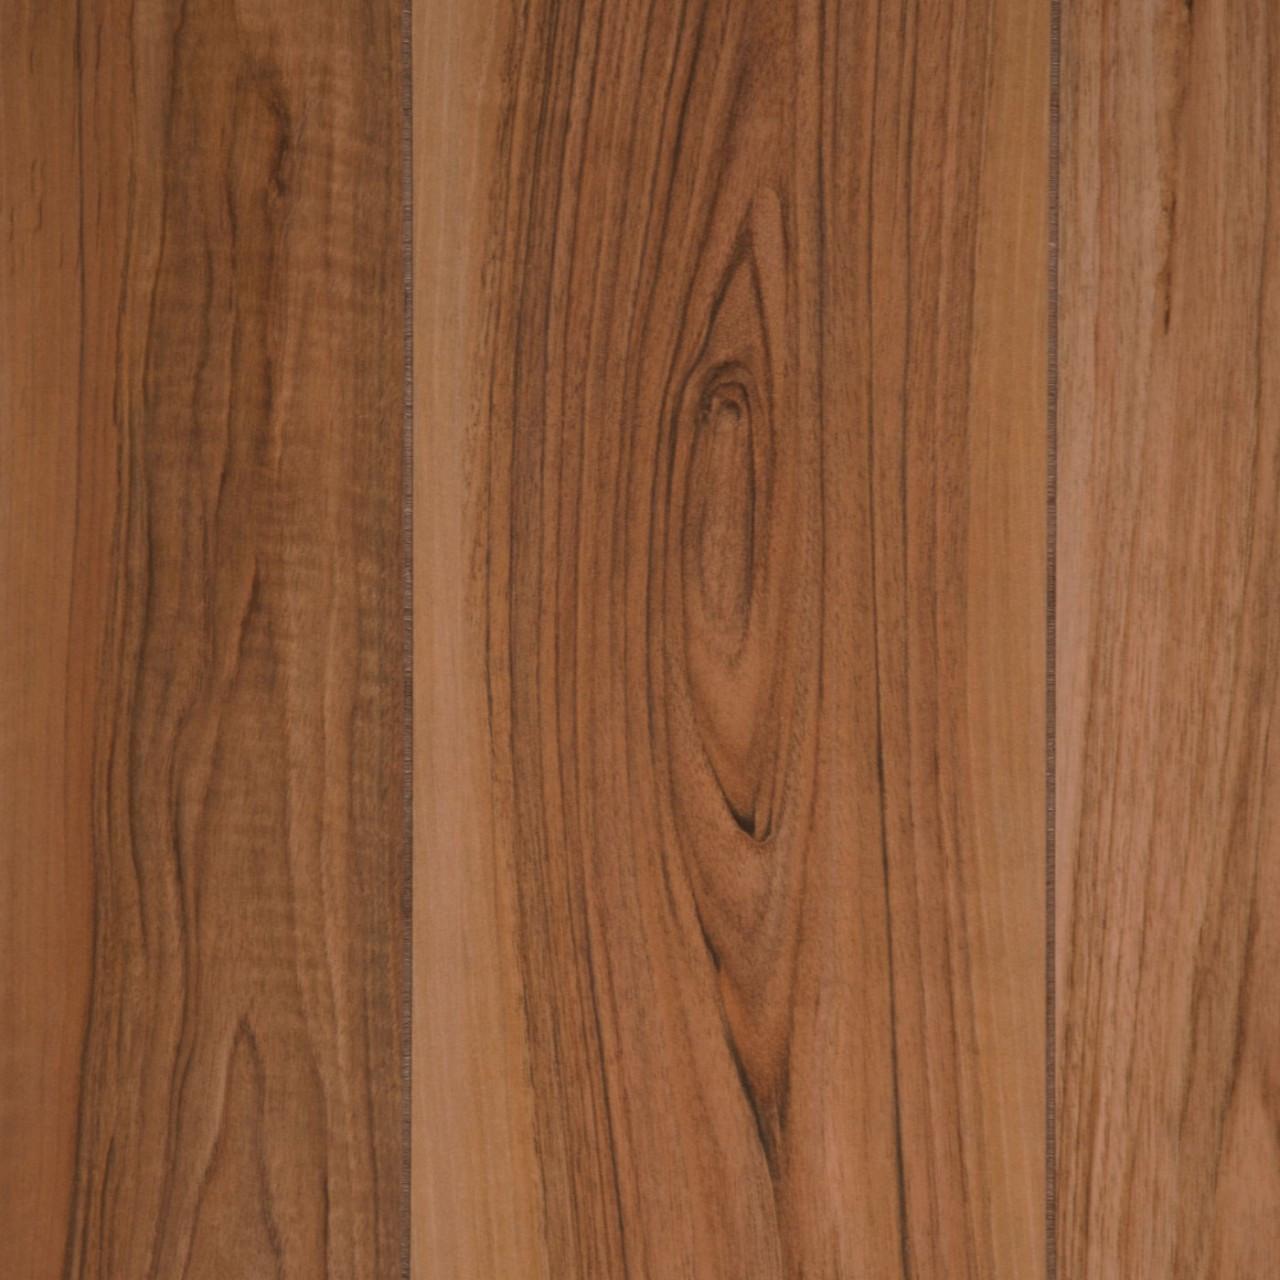 Wood Paneling Sheets : Wood paneling manhattan walnut plywood planks